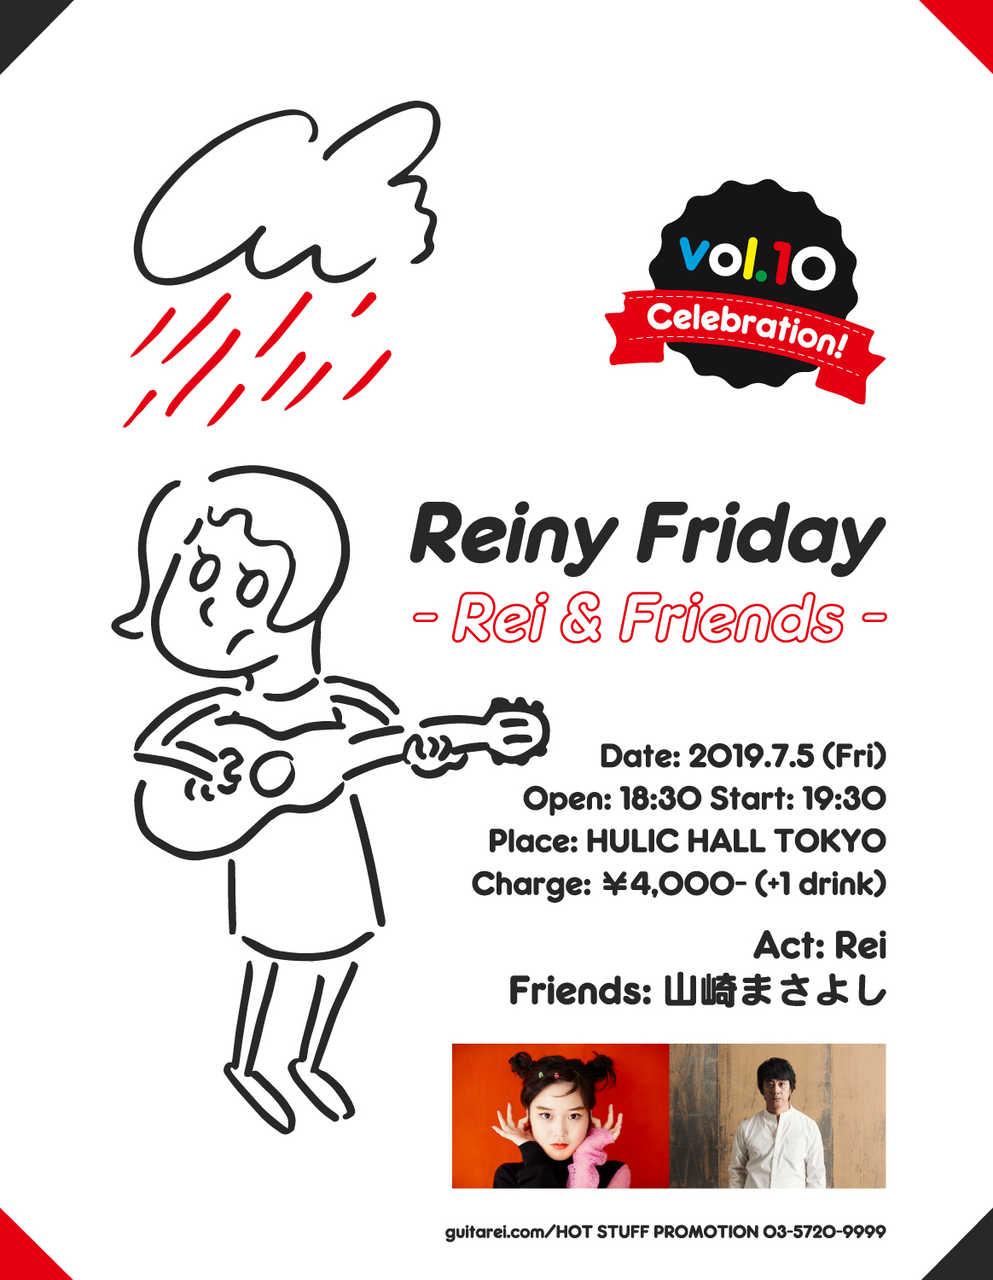 『Reiny Friday -Rei & Friends- Vol.10』